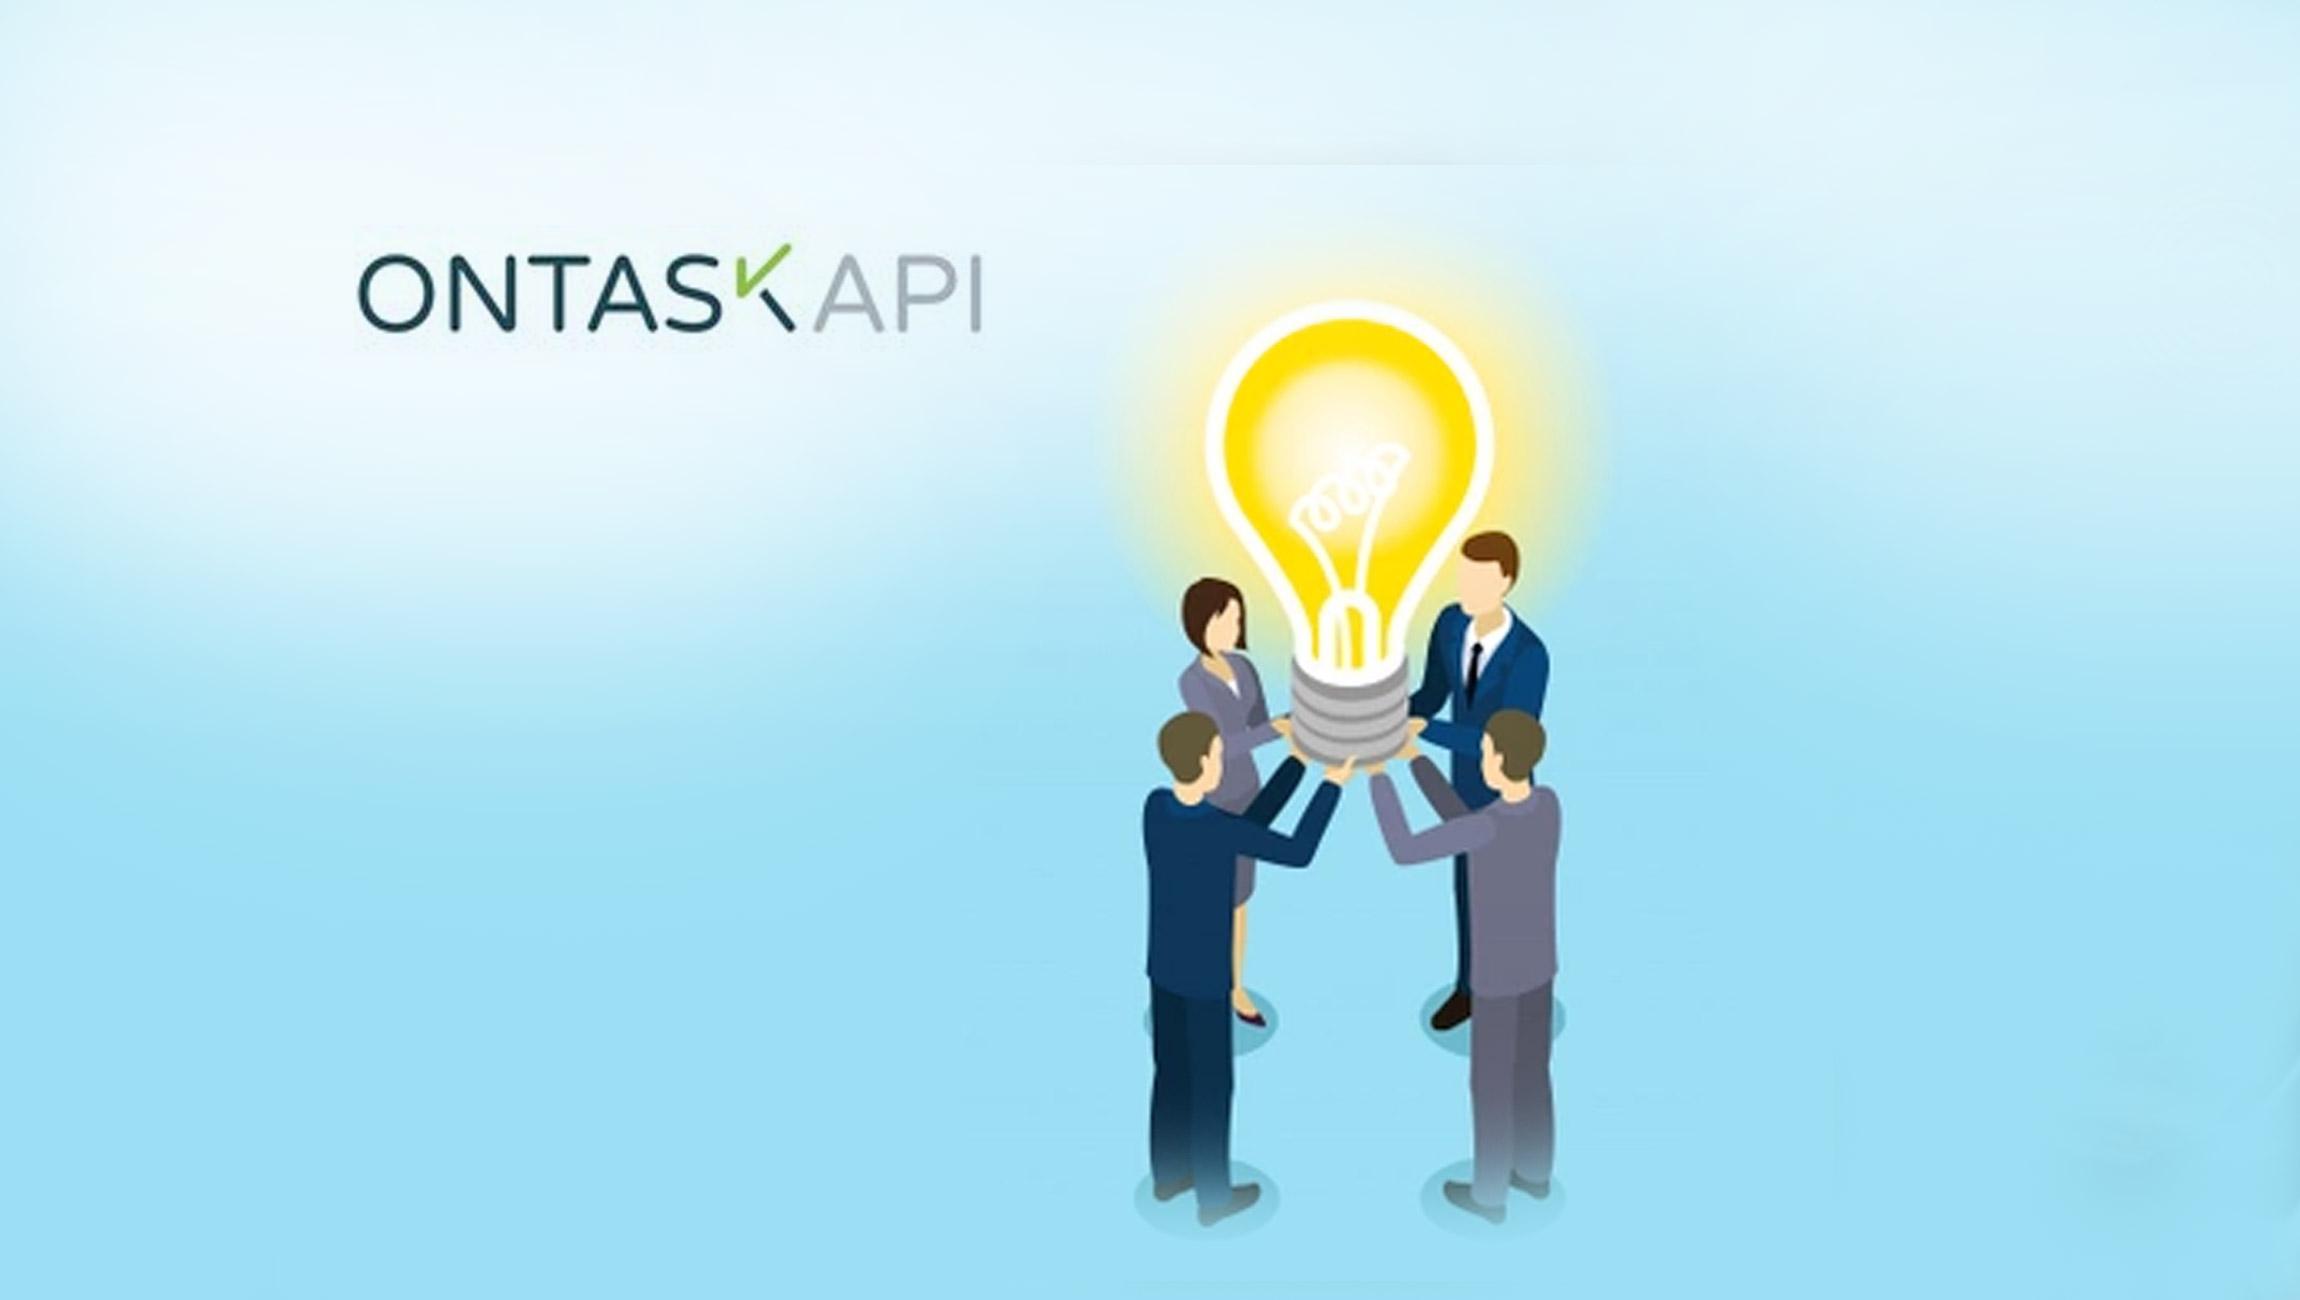 OnTask Announces New Product, OnTask API